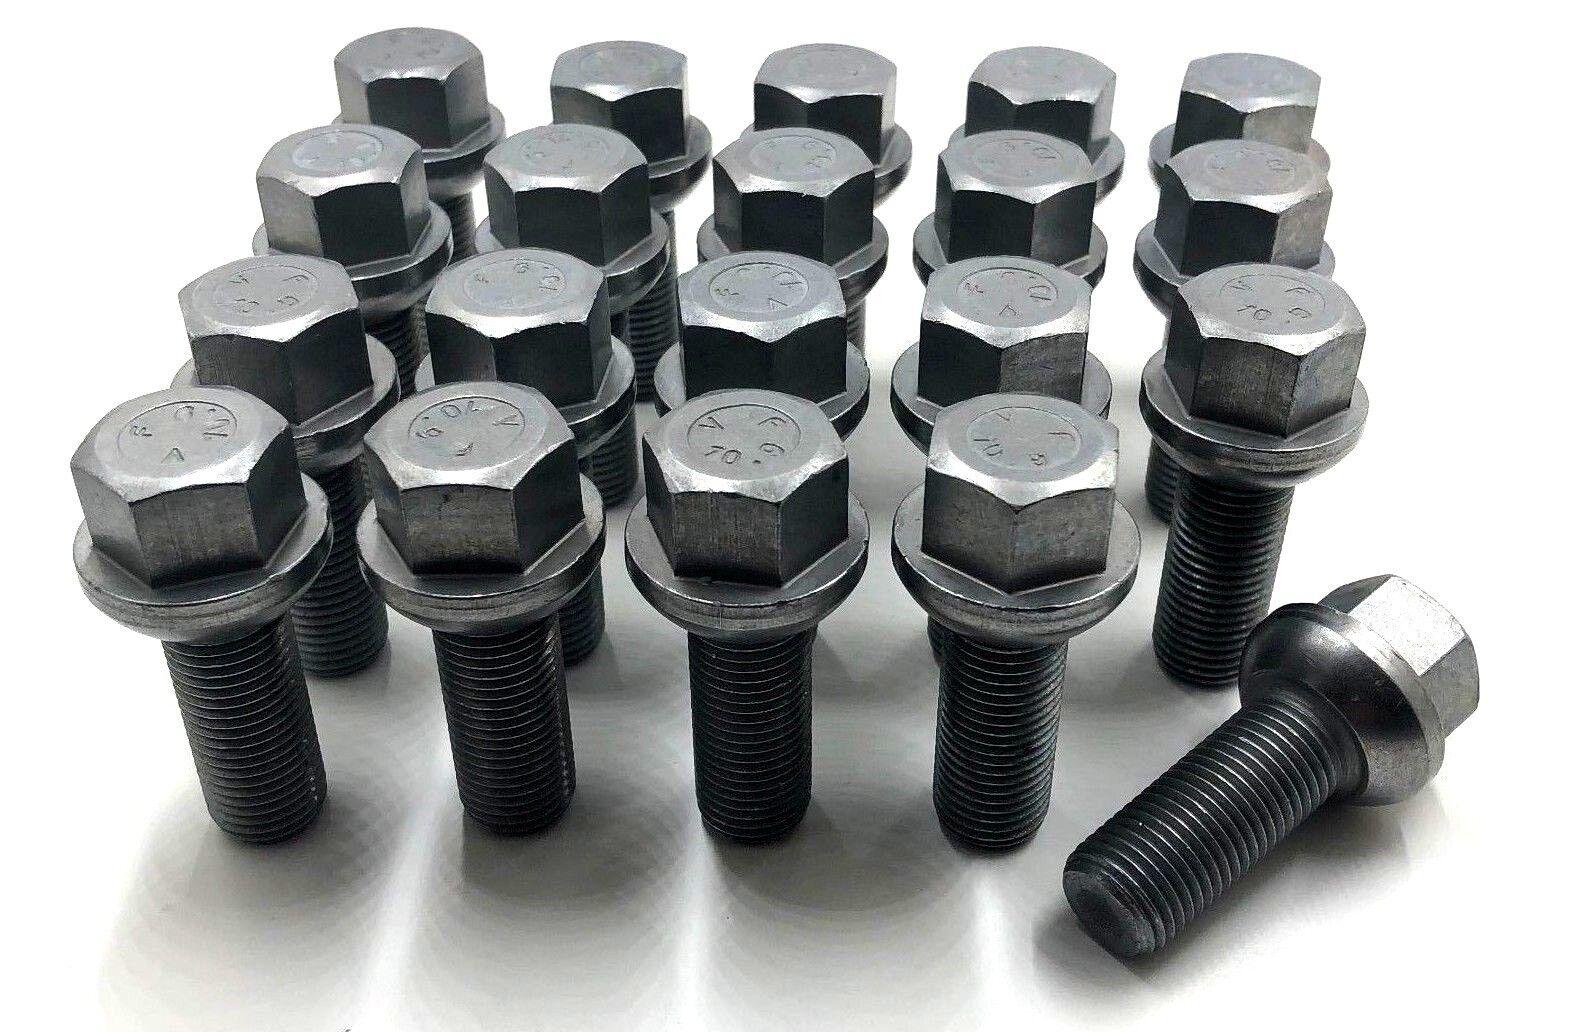 20 x Alloy Wheel Bolts Lugs M14 x 1.5 17mm Hex 45mm Thread Radius Seat Audi VW